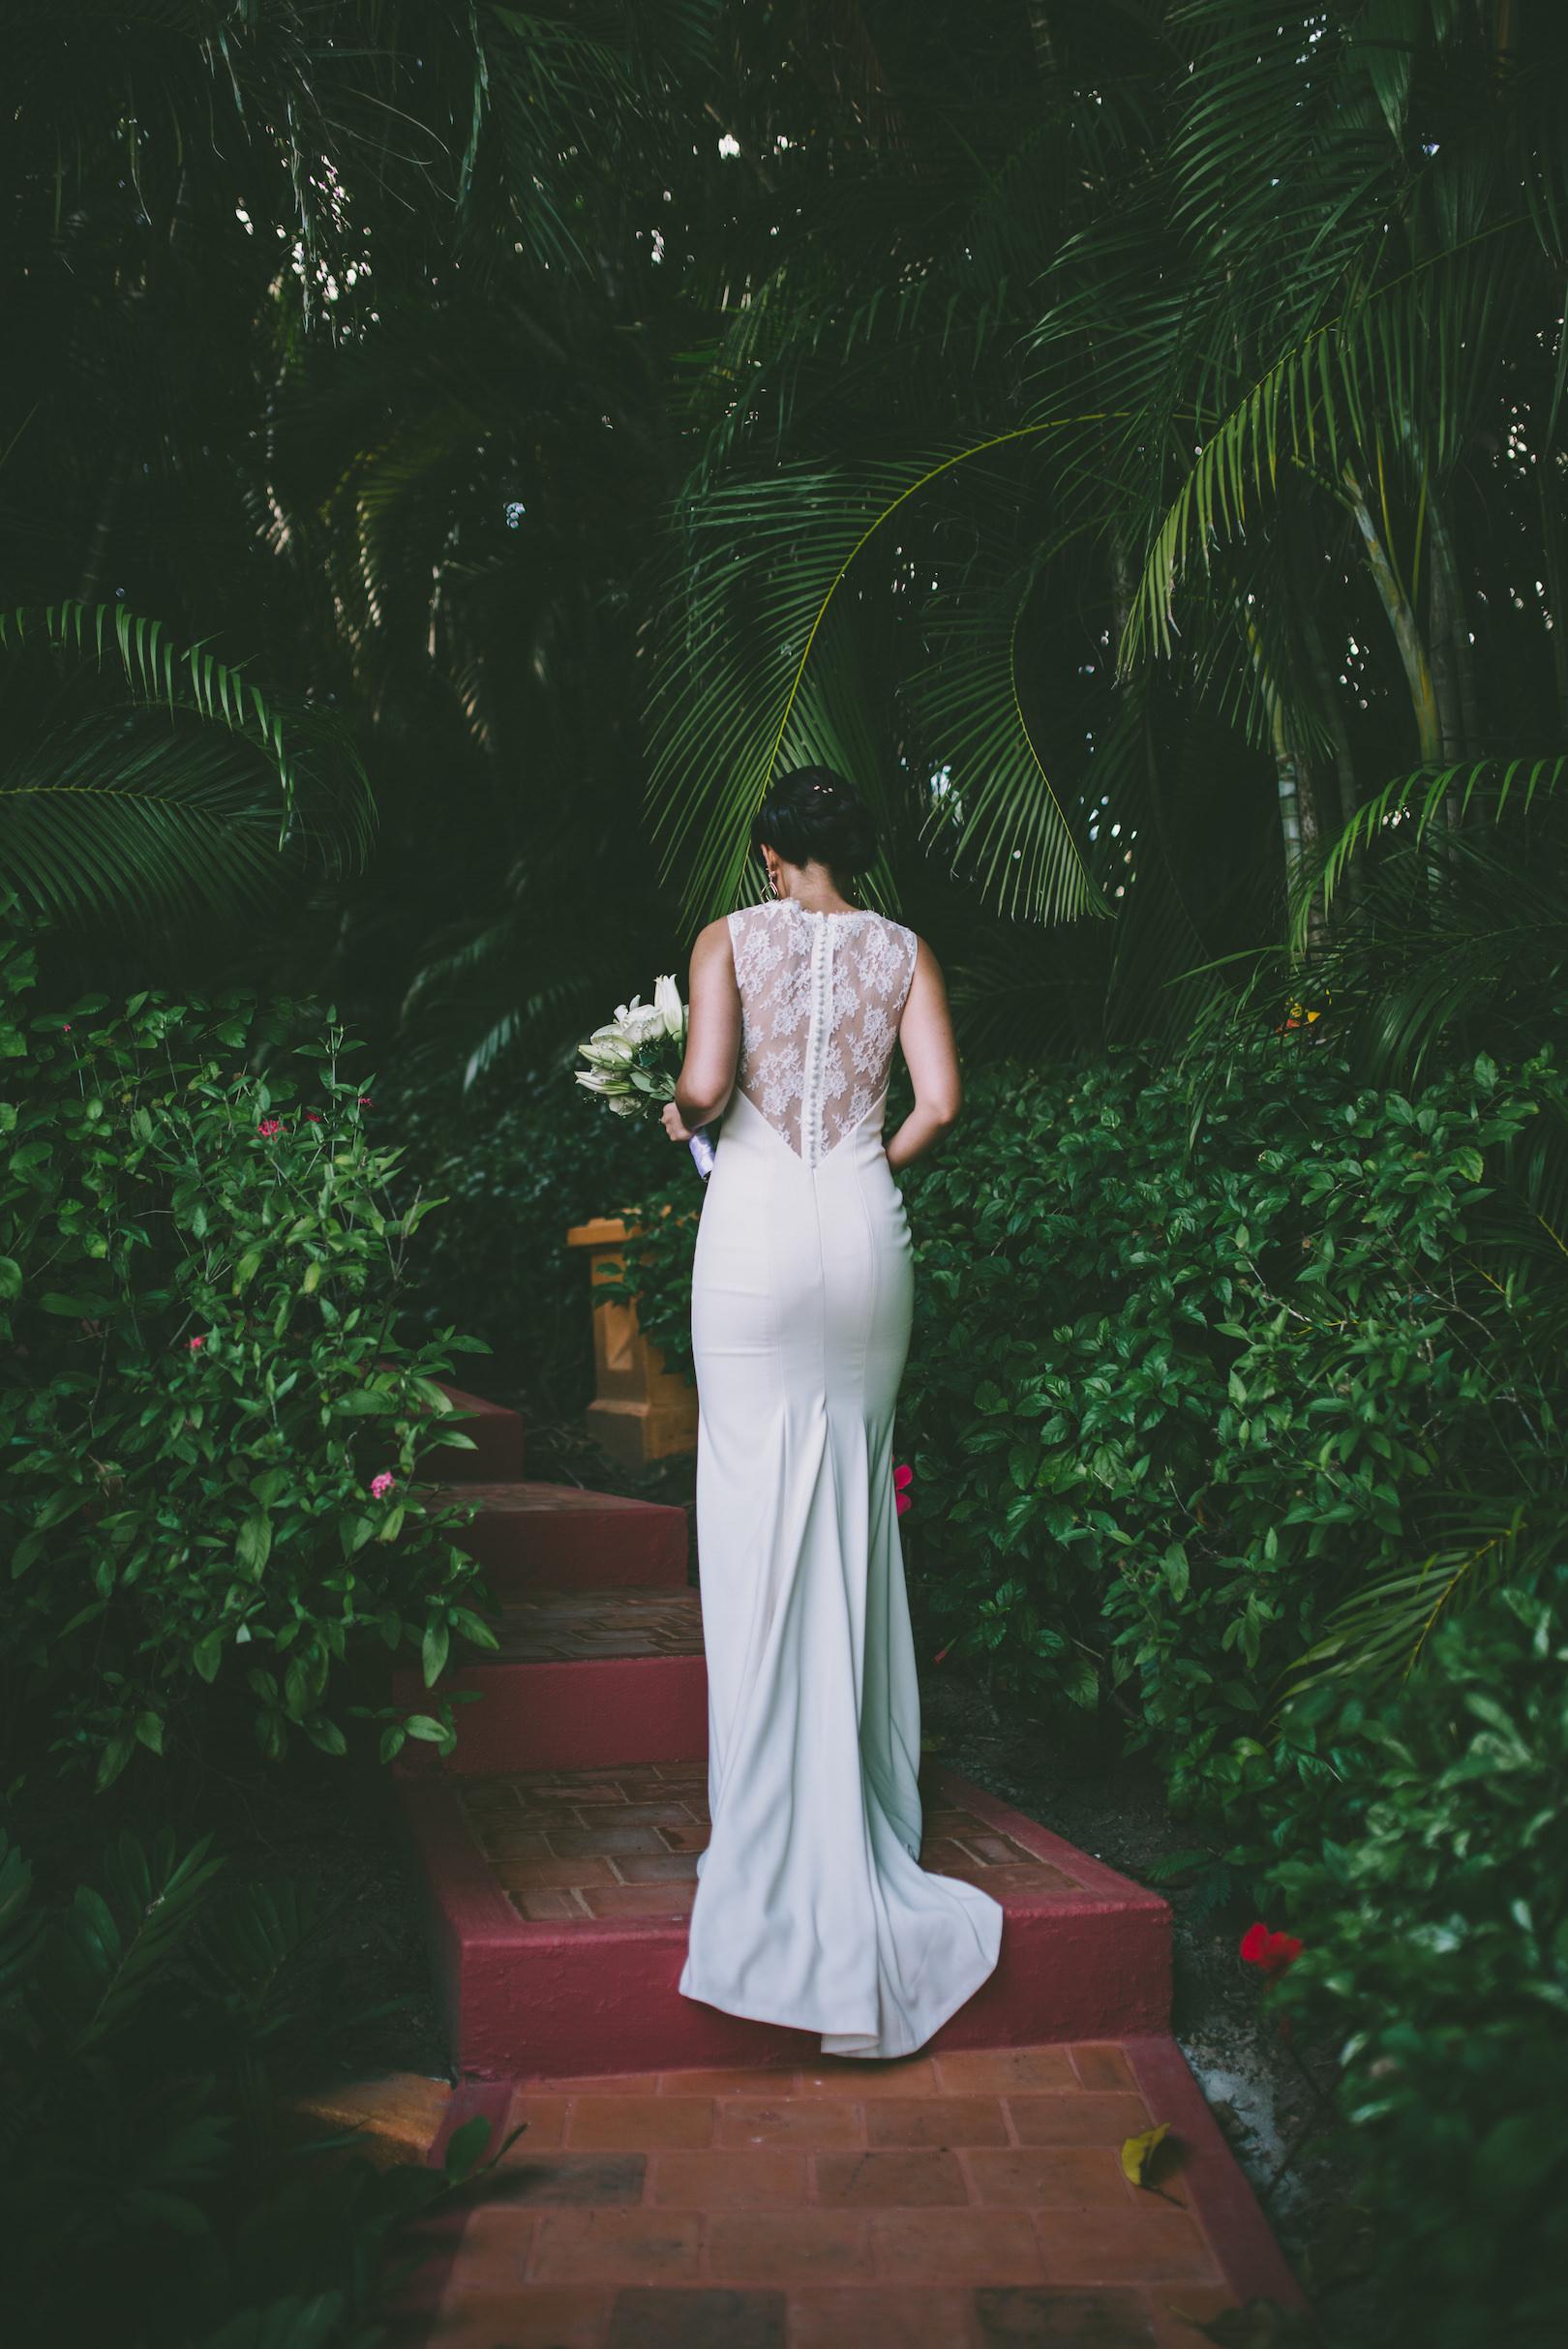 Nathan & Felicia - Wedding Day - © Dallas Kolotylo Photography - 250